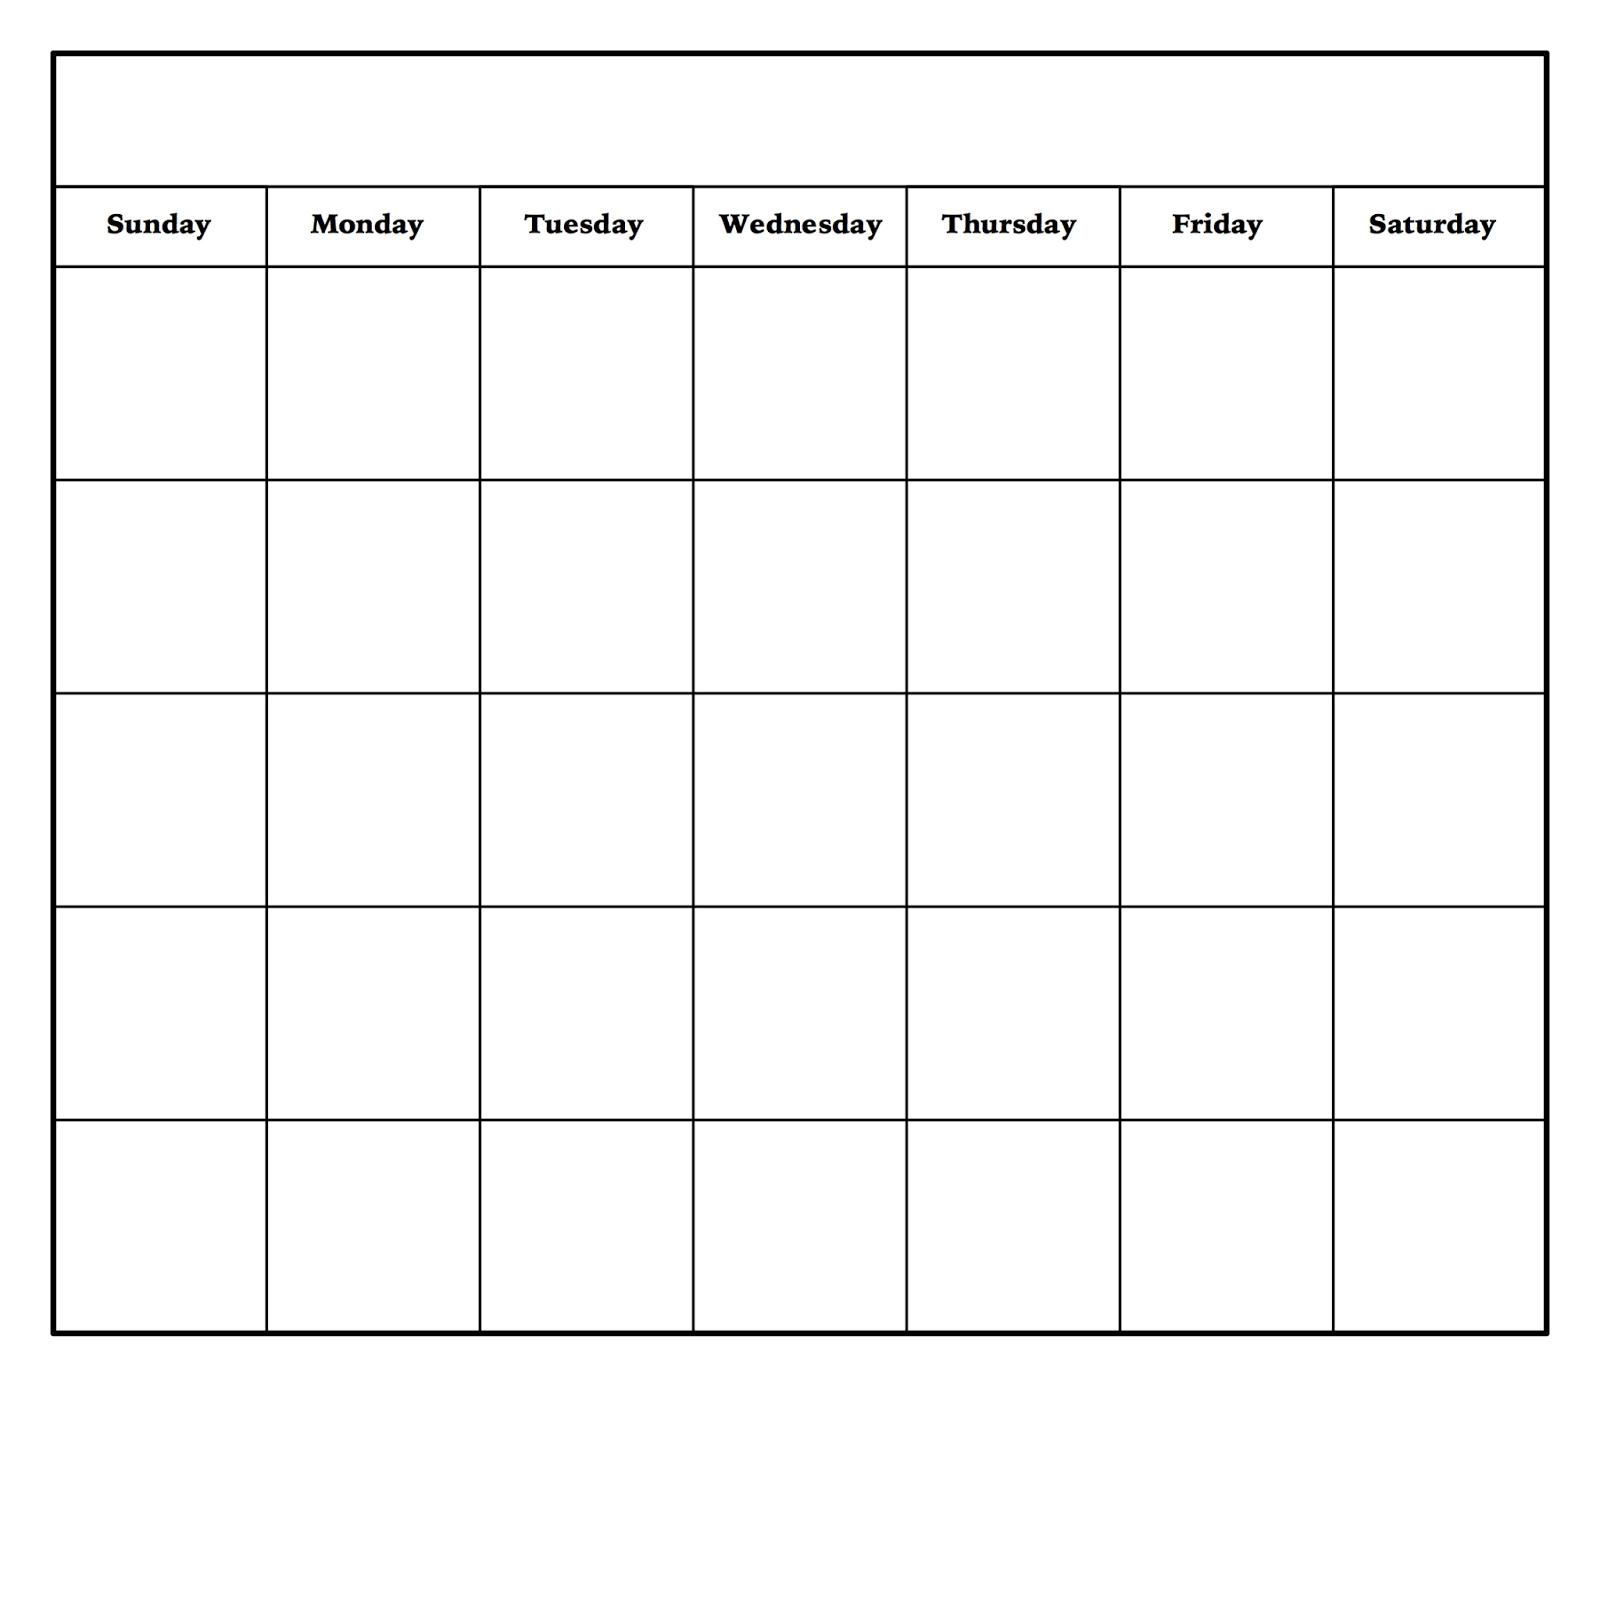 Blank Monday Through Friday Pdf   Calendar Template Printable Free Printable Mondat Through Friday Weekly Calendar